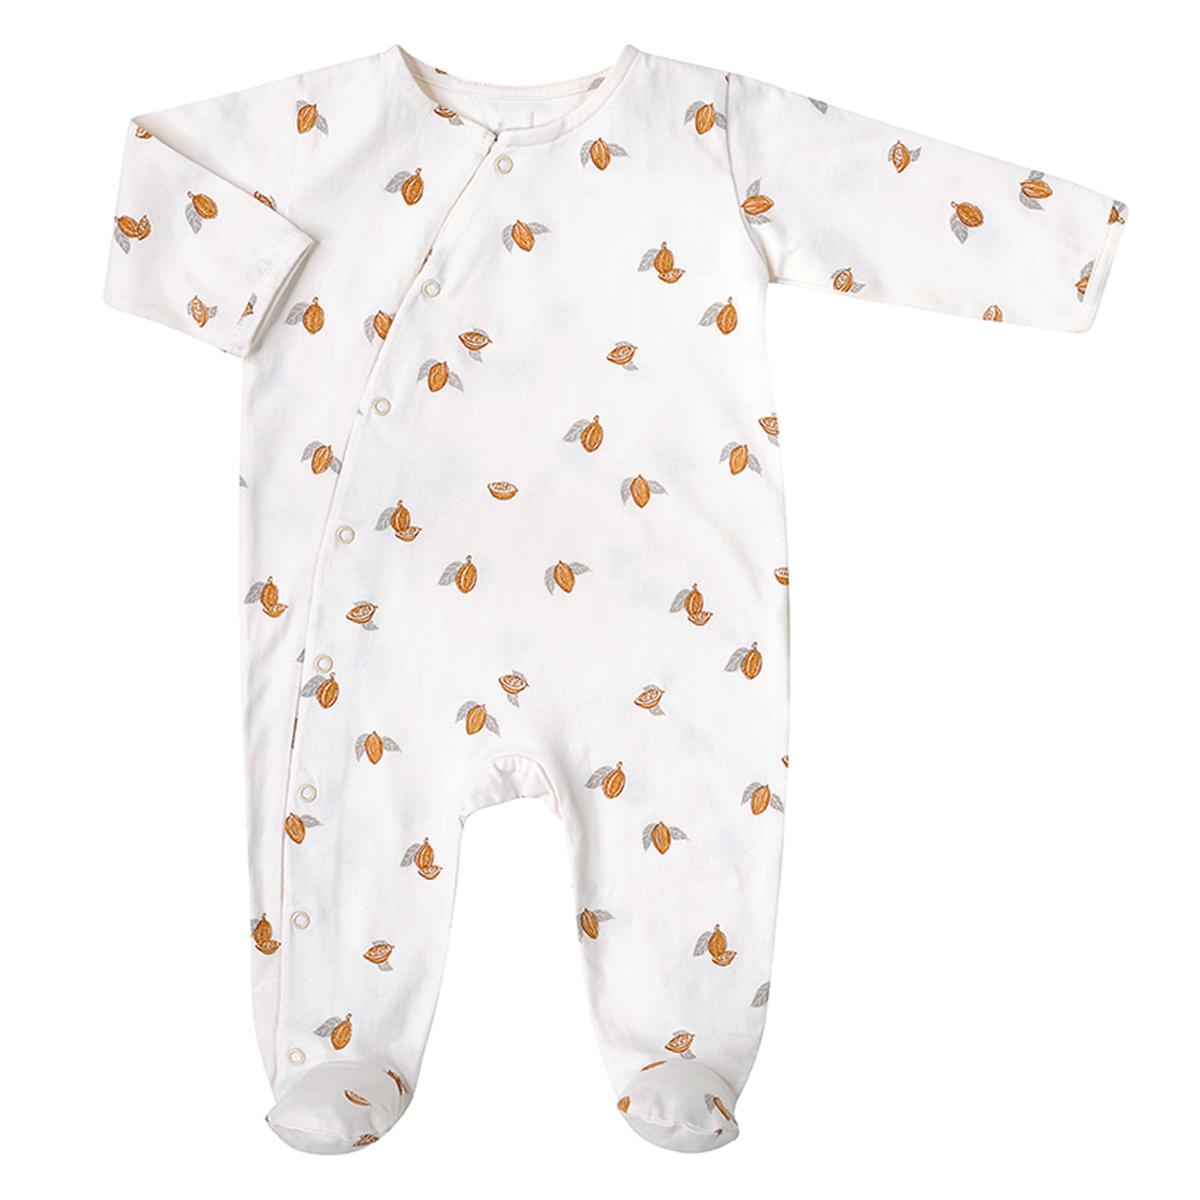 Body & Pyjama Combinaison Jour et Nuit Tonka - 1 Mois Combinaison Jour et Nuit Tonka - 1 Mois